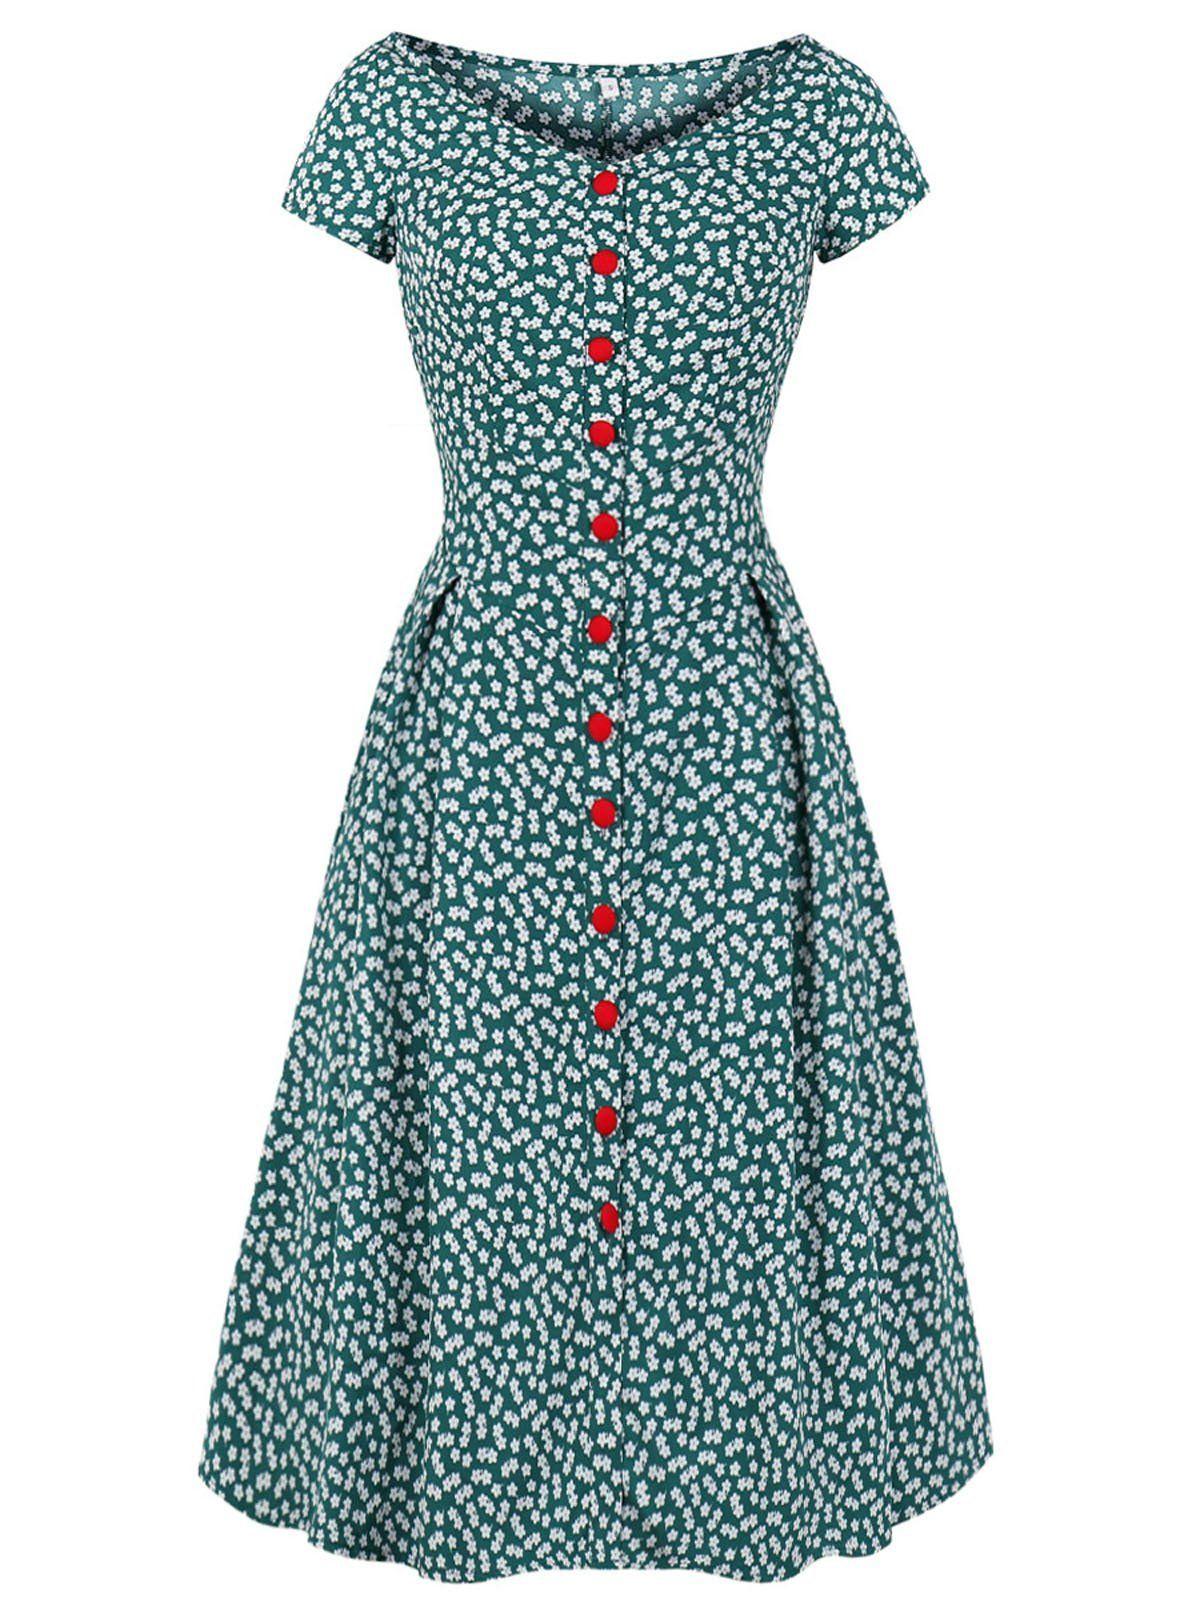 Green 1940s Floral Loose Button Dress Elegant Summer Dresses Vintage Dresses Elegant Dresses For Women [ 1600 x 1200 Pixel ]